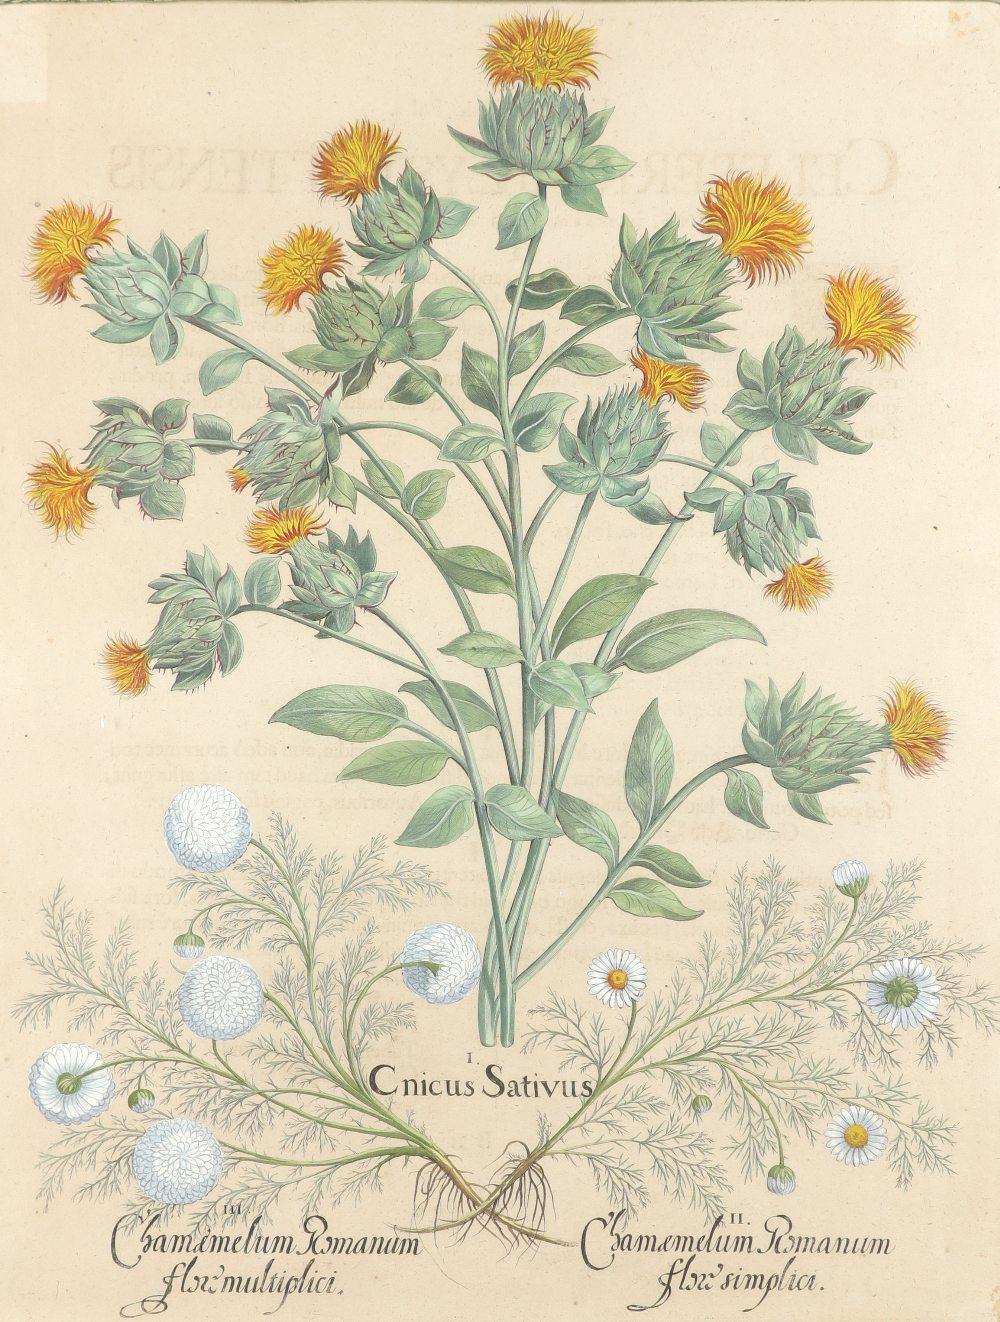 After Basilius Besler Poma flore multiplici; Aquilegia stellata flore vio laceo; Cytisus - Image 16 of 36